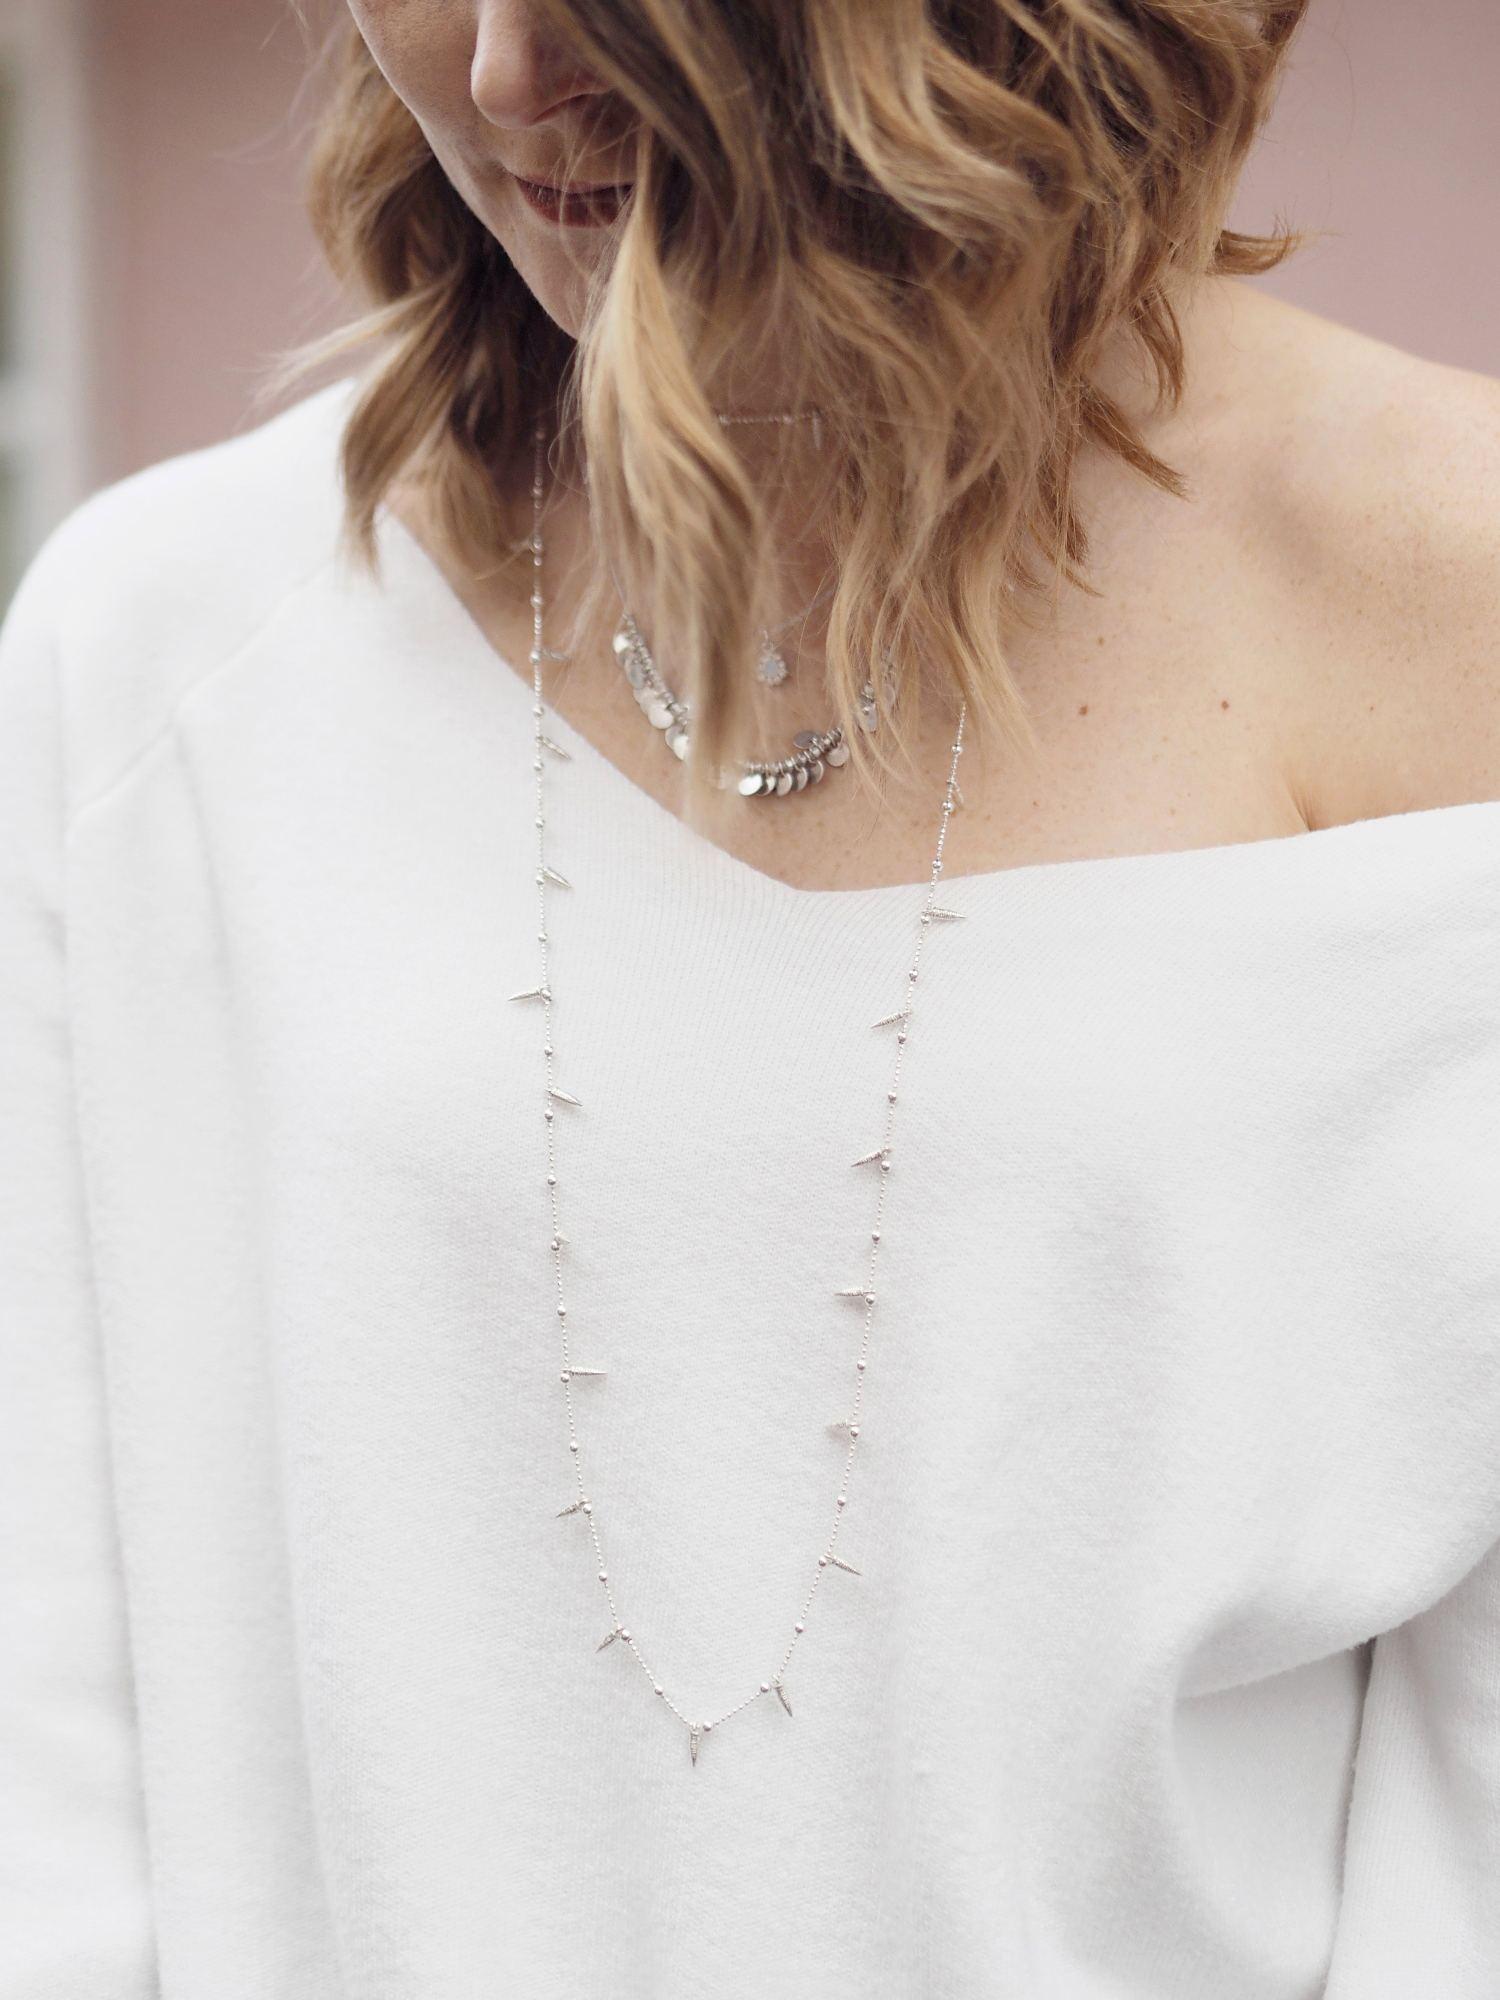 chlo bo jewellery necklace